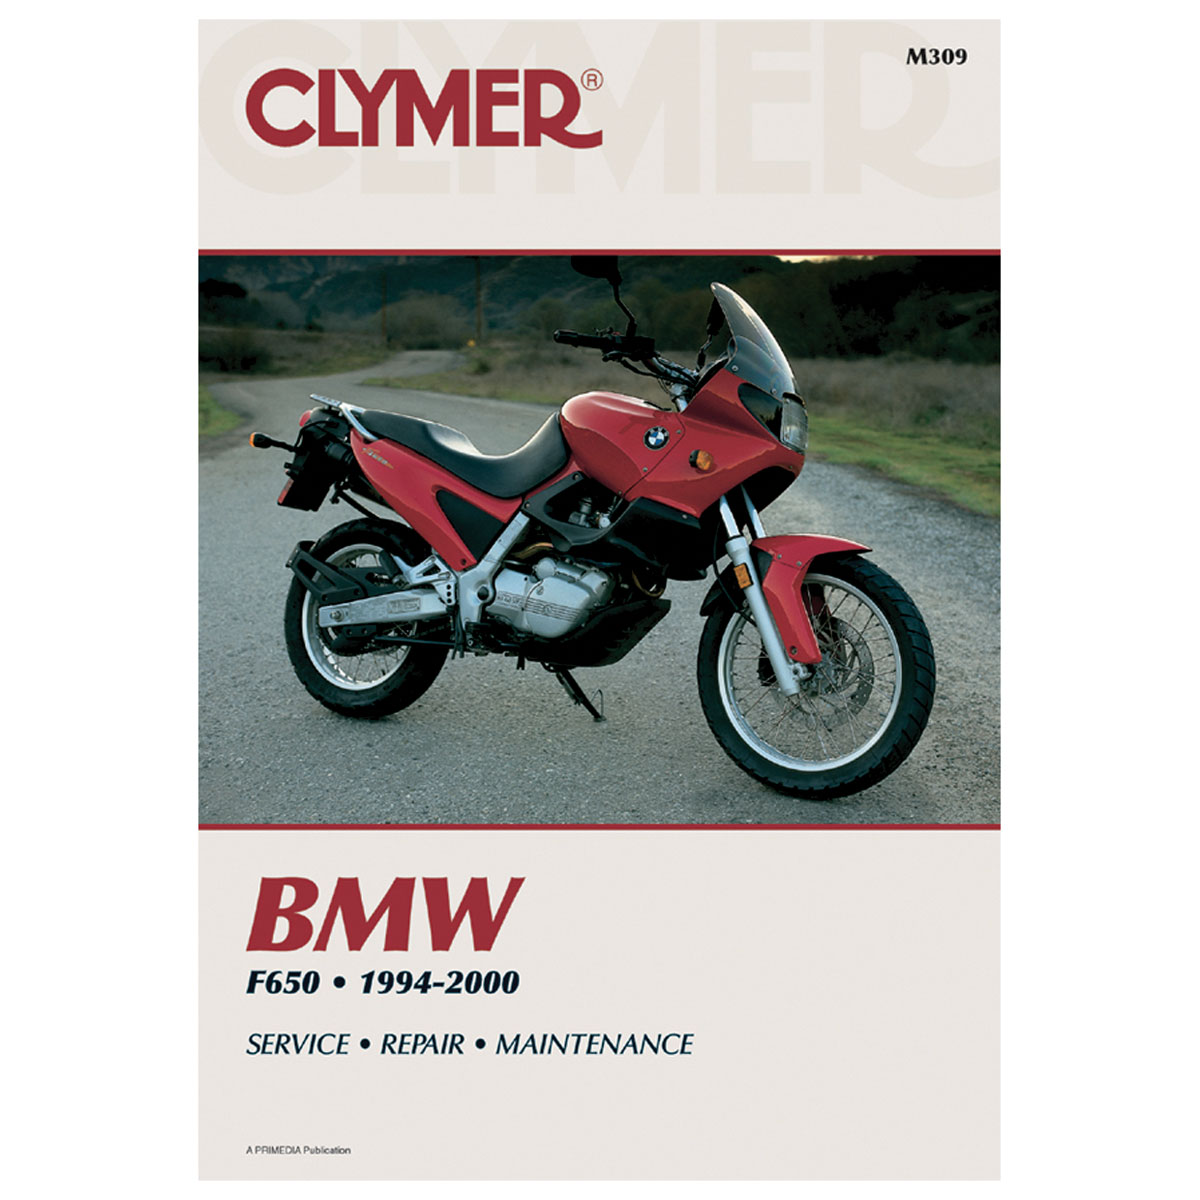 clymer bmw motorcycle repair manual 181 2291 j p cycles rh jpcycles com bmw motorcycle owners manual free download bmw motorcycle service manuals free download